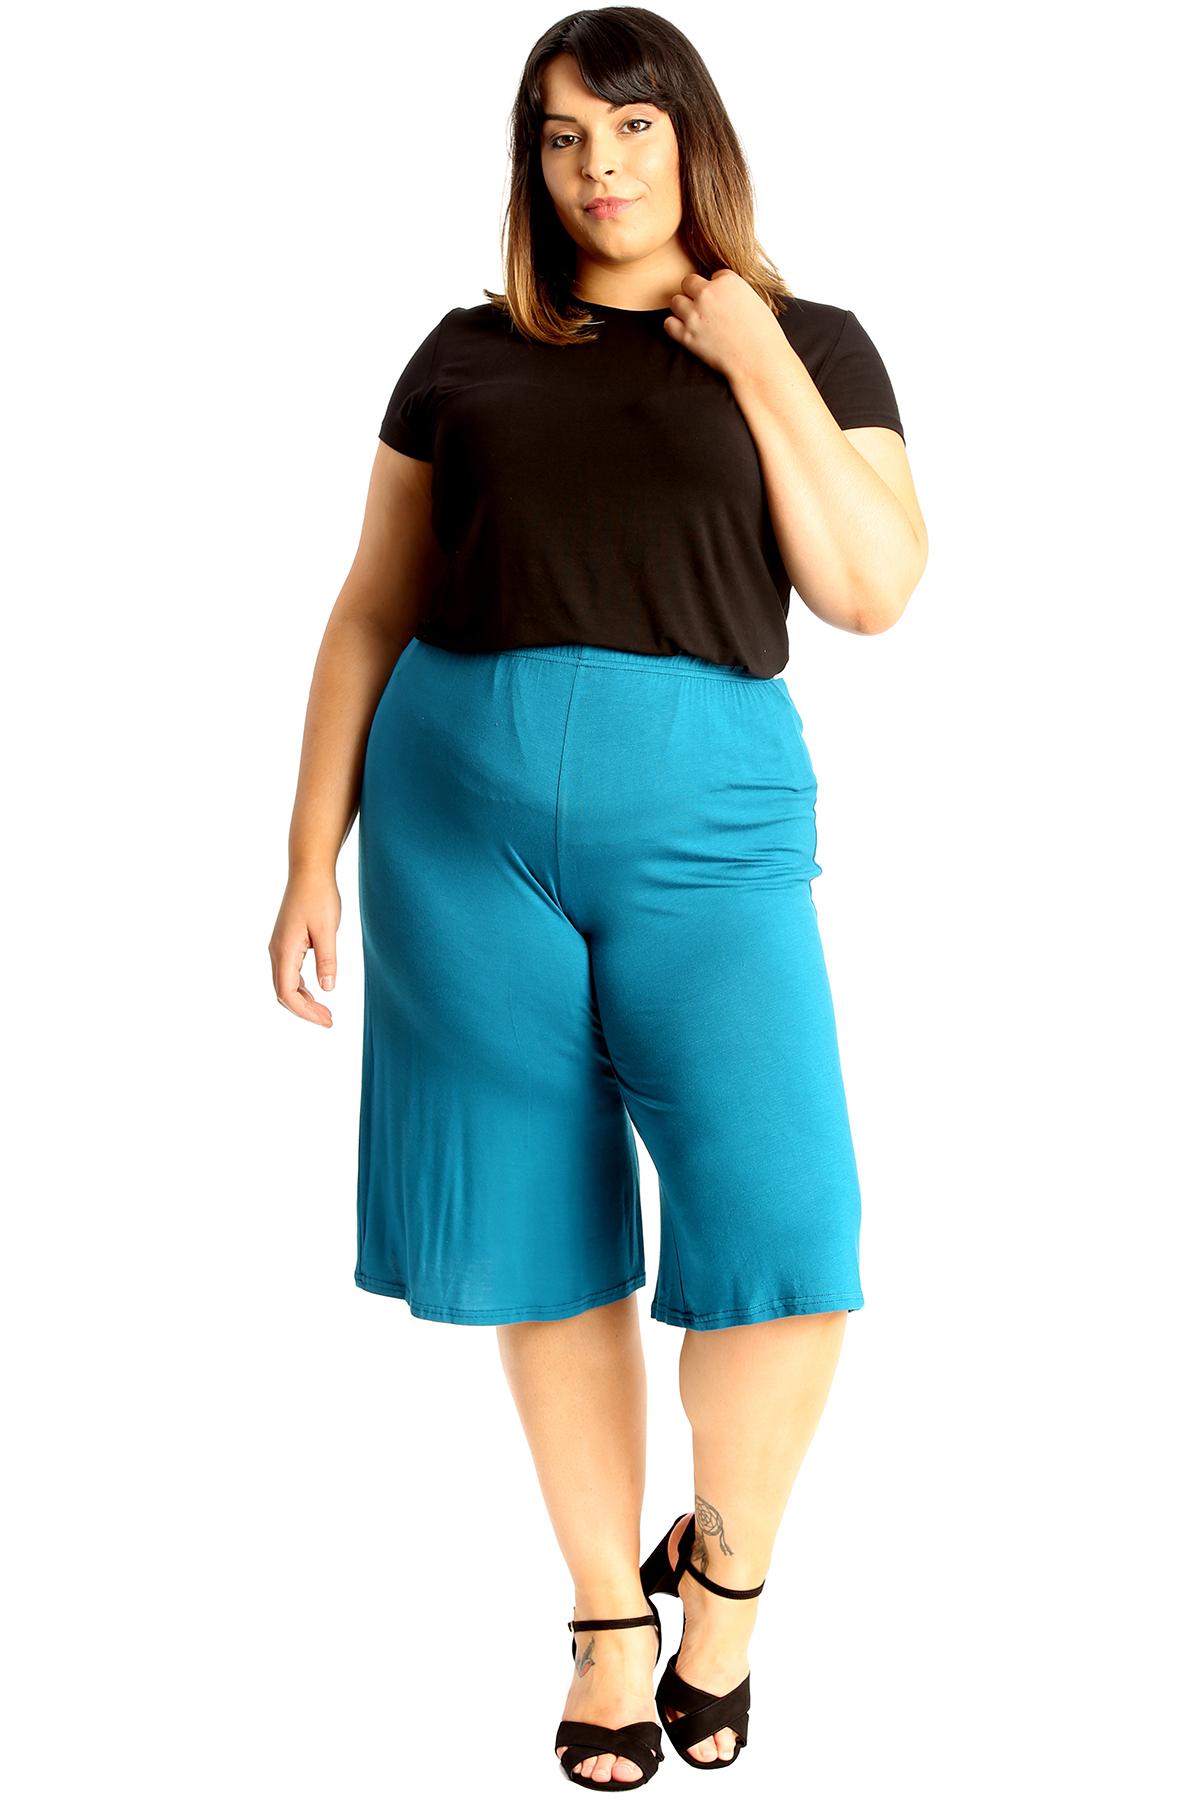 New-Womens-Plus-Size-Culottes-Ladies-Plain-Shorts-Palazzo-Elastic-Pants-Summer thumbnail 38